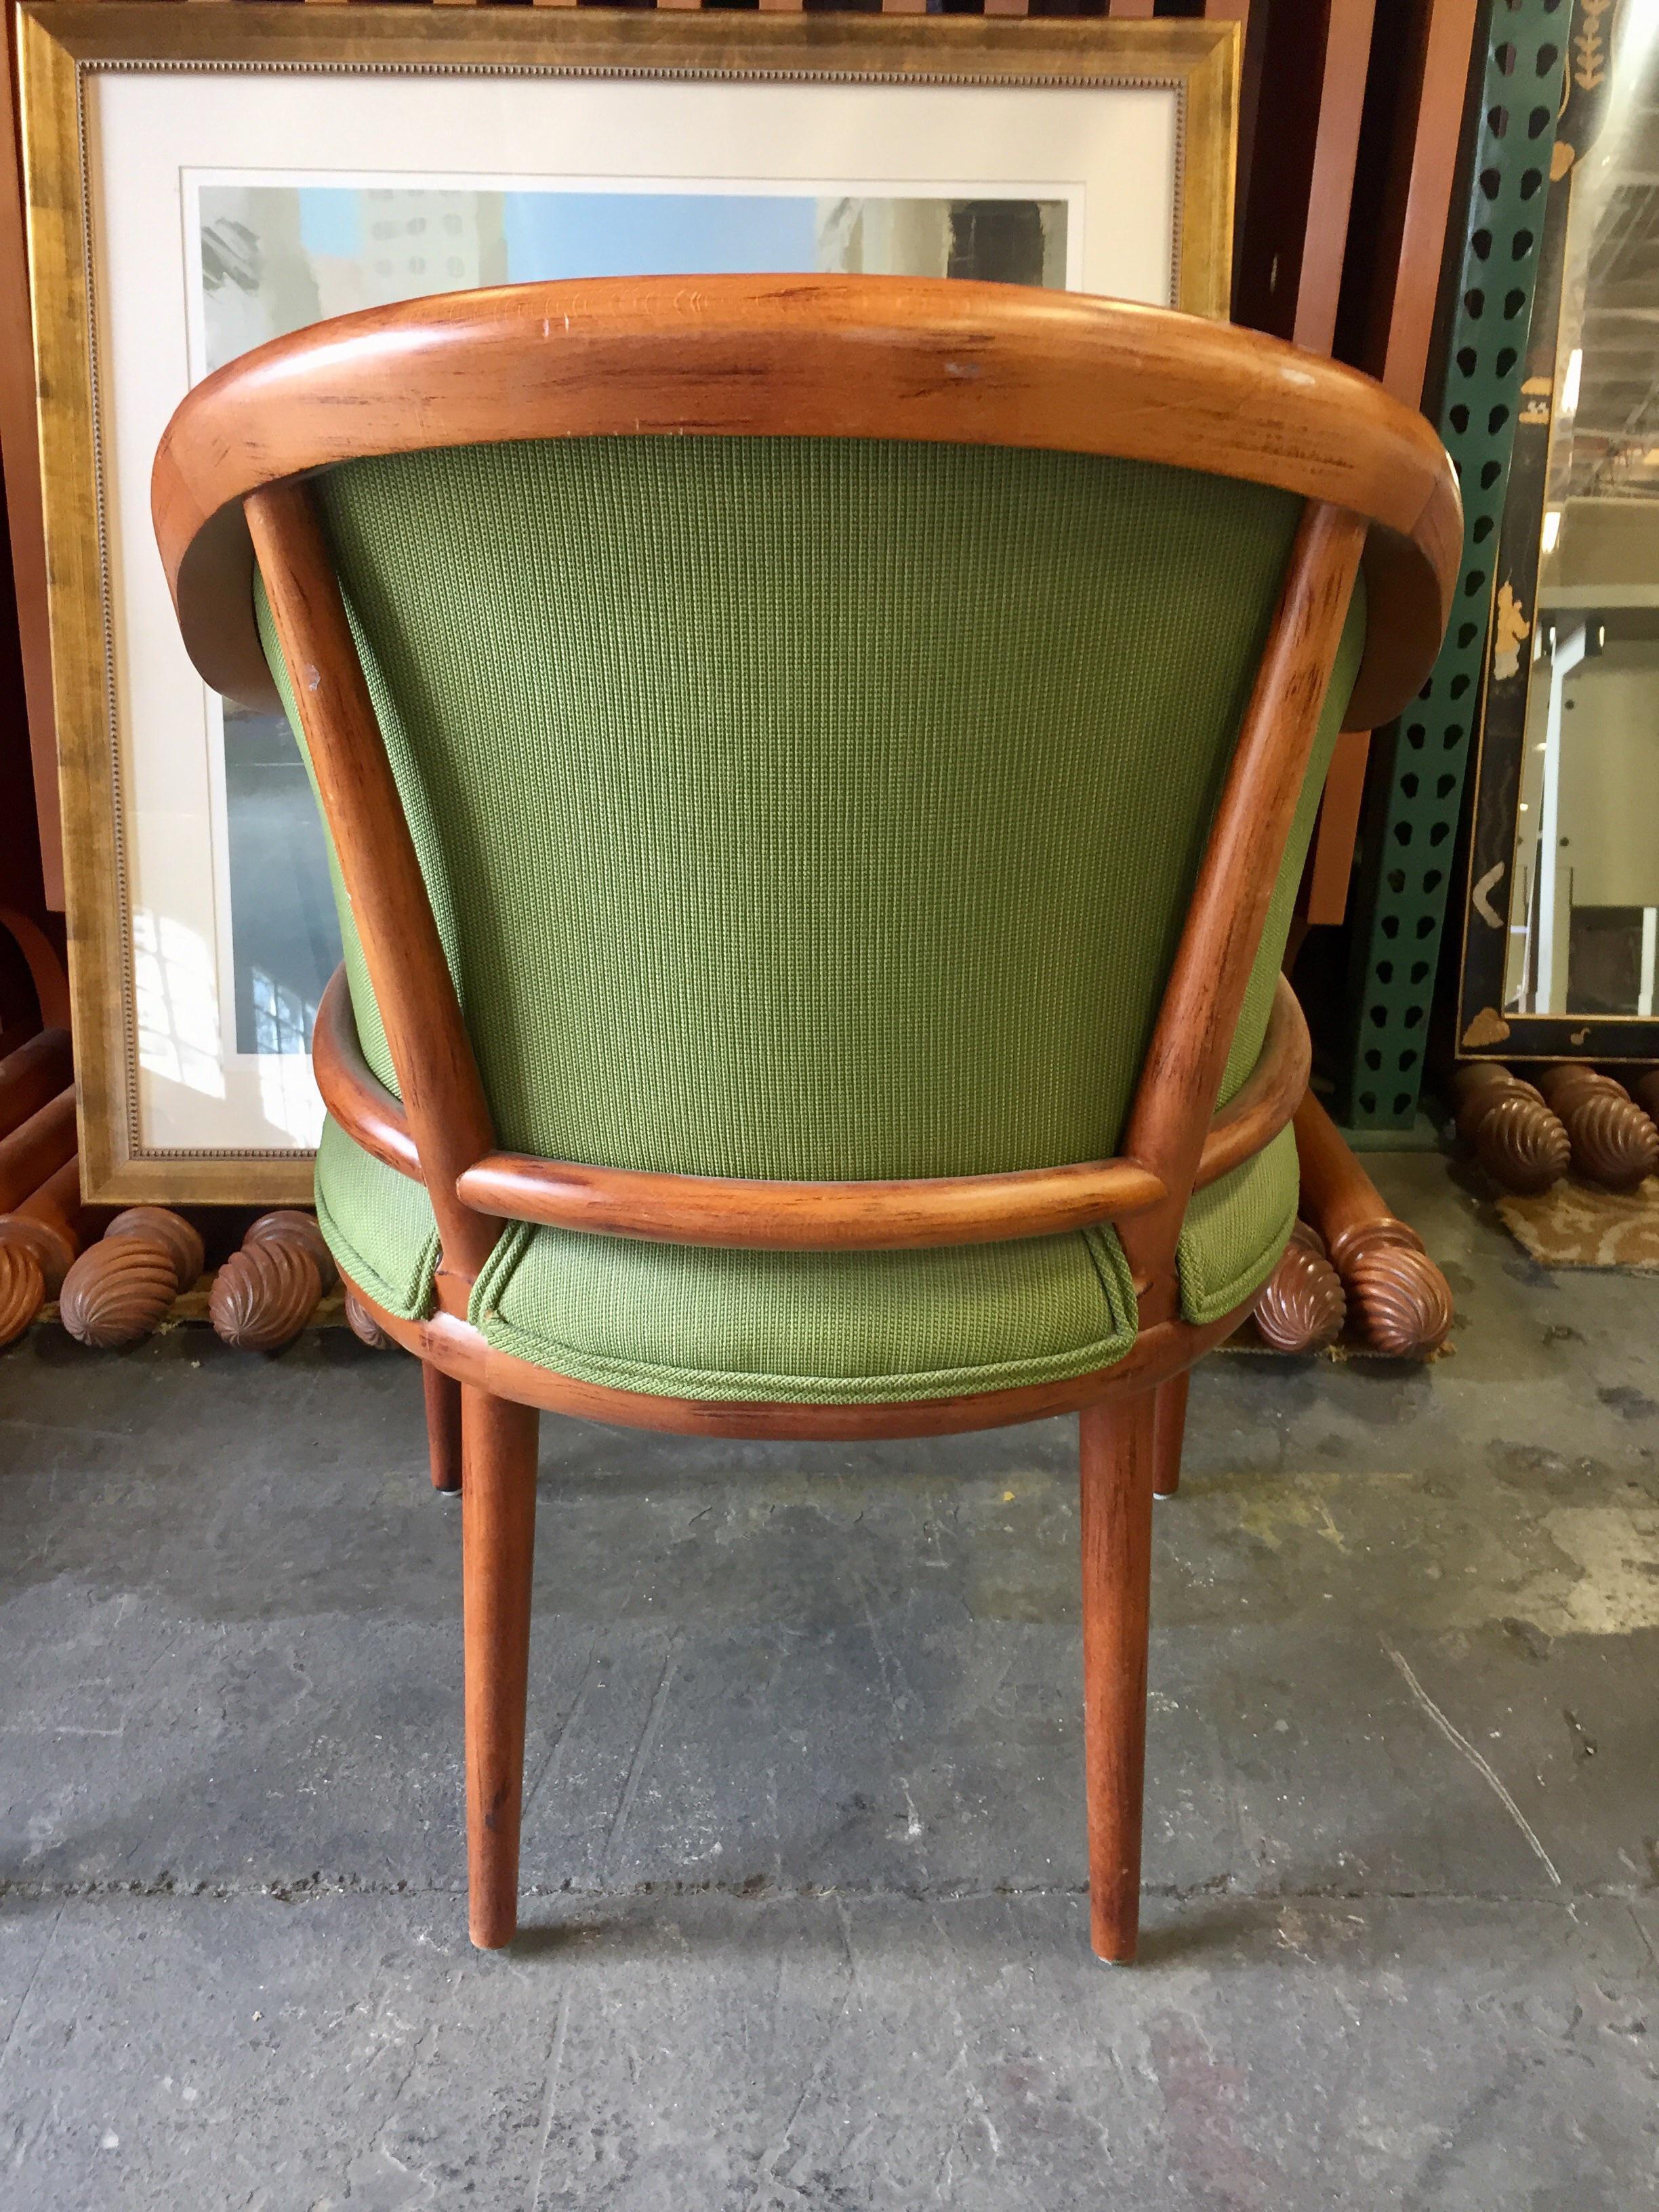 Green Corduroy U0026 Bent Wood Chair For Sale   Image 5 ...